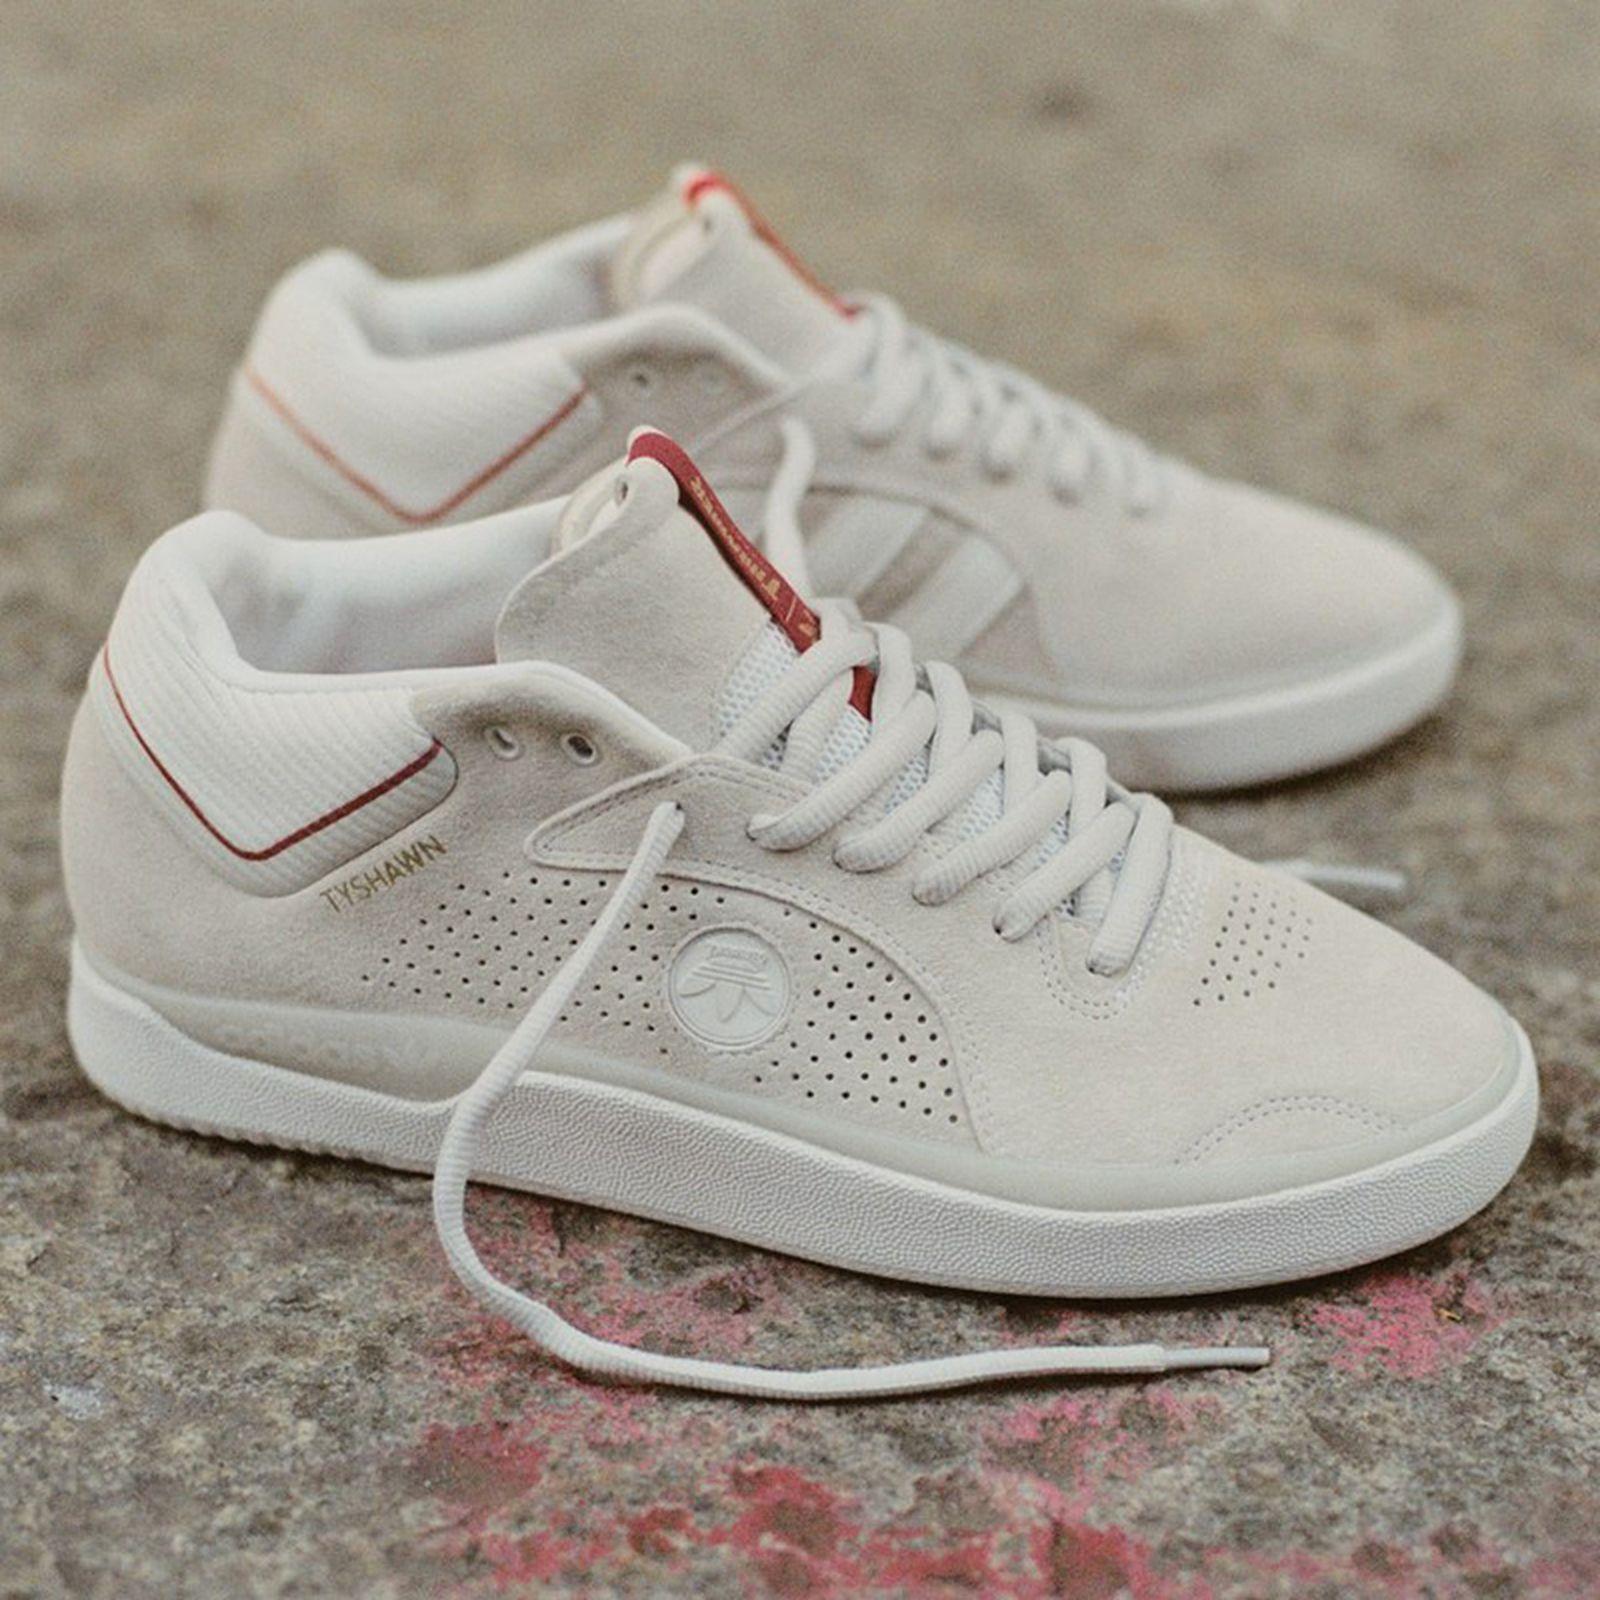 thrasher-adidas-superstar-adv-tyshawn-jones-release-date-price-05